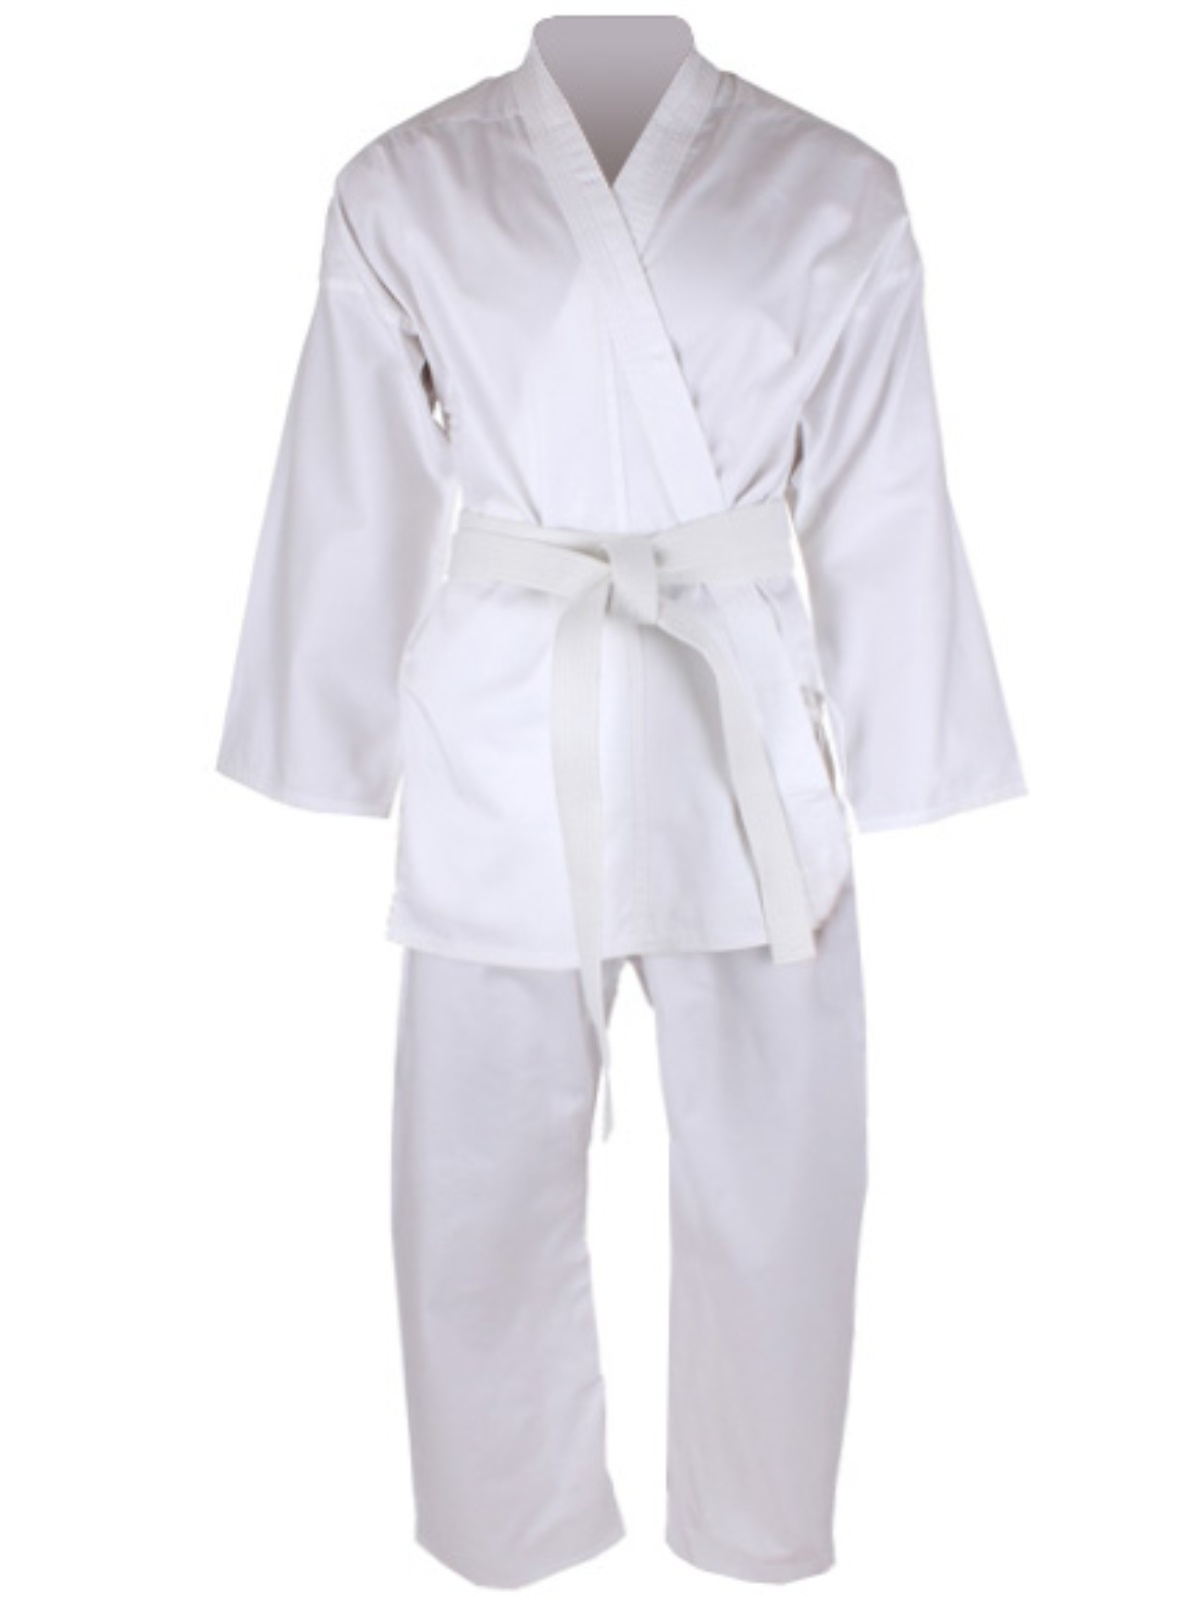 Kimono Karate - 200 cm